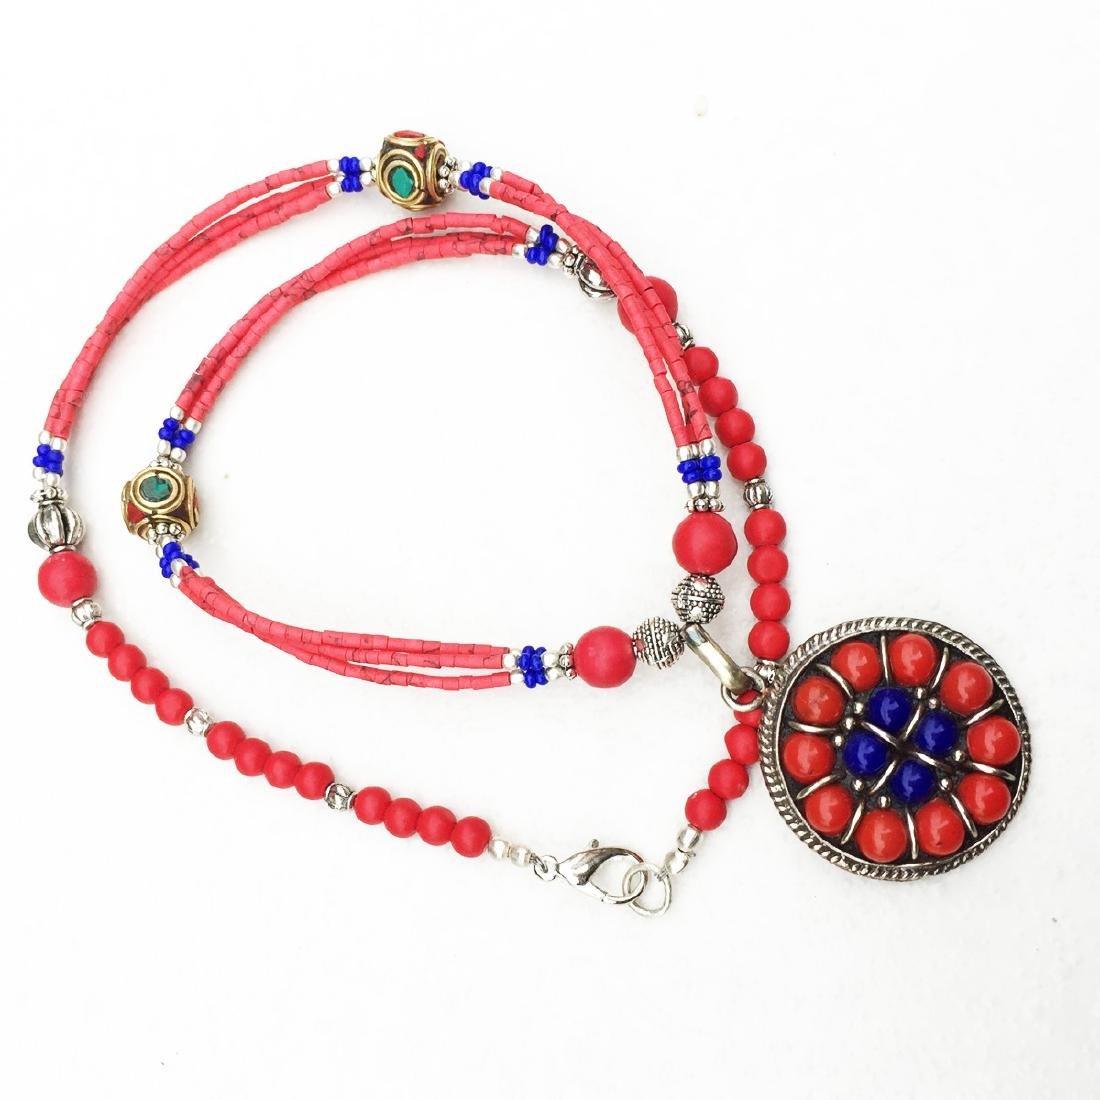 Tibetan Natural Coral Handmade Necklace